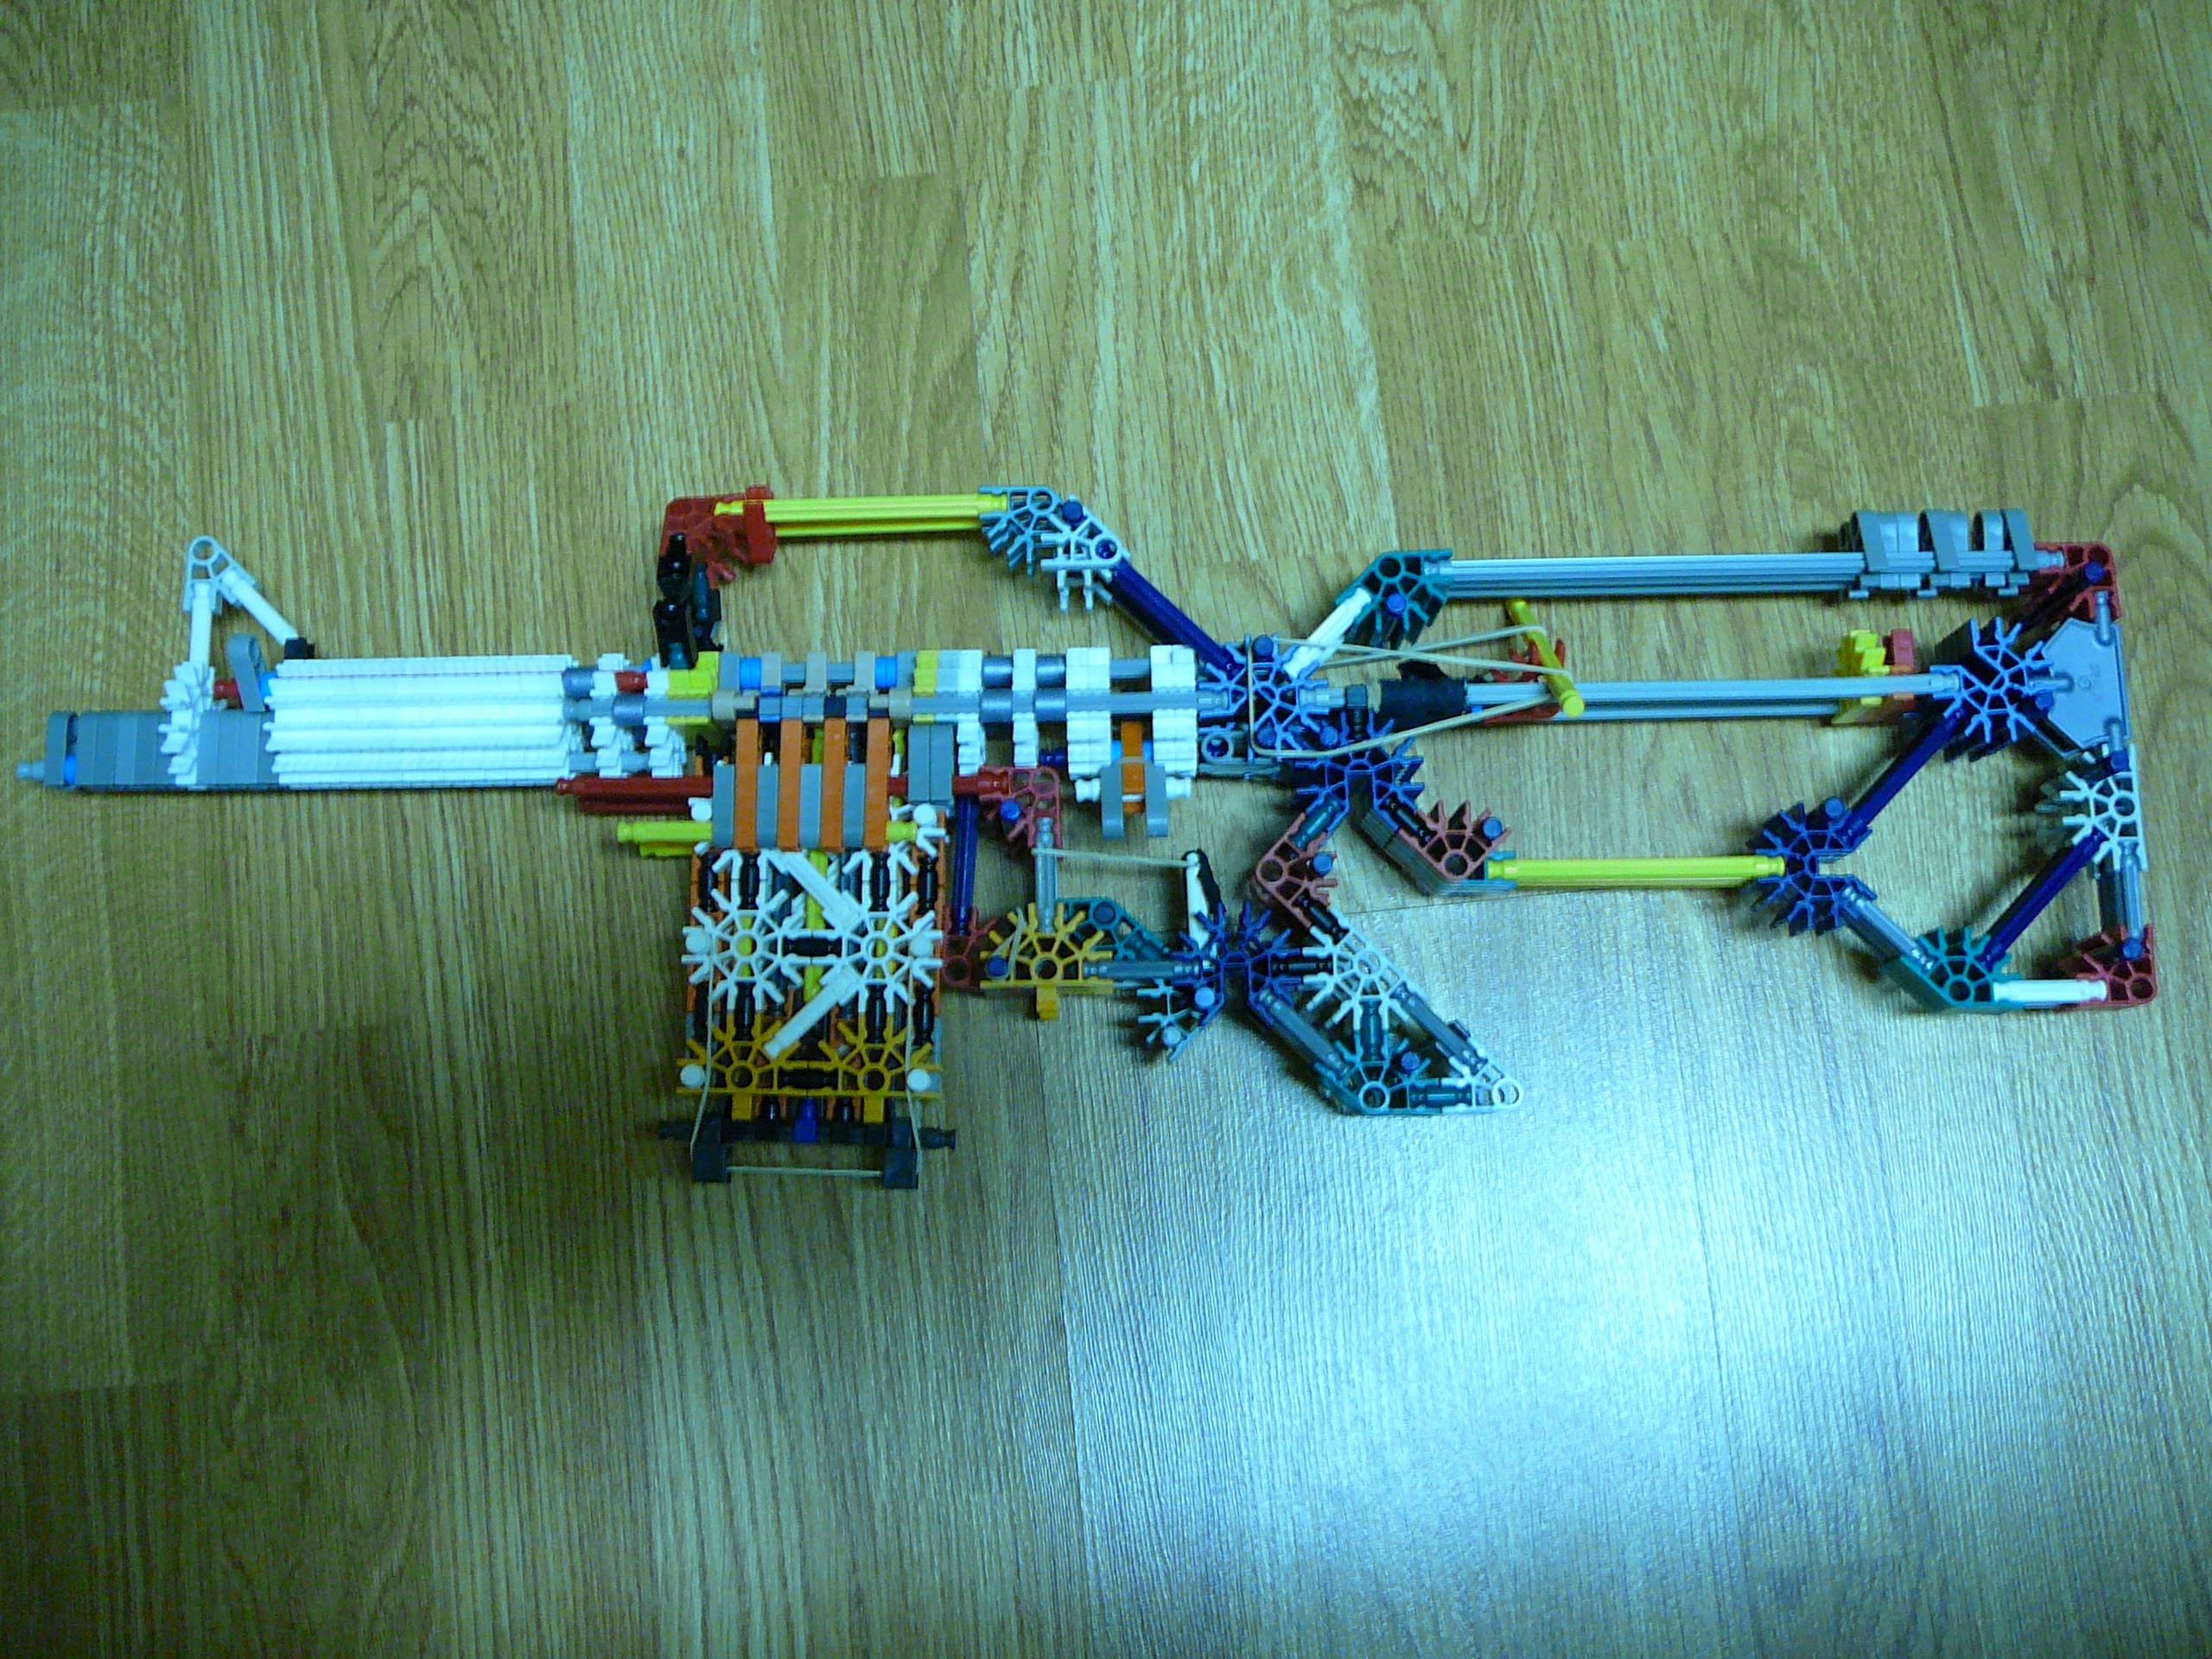 m4a1 knex gun